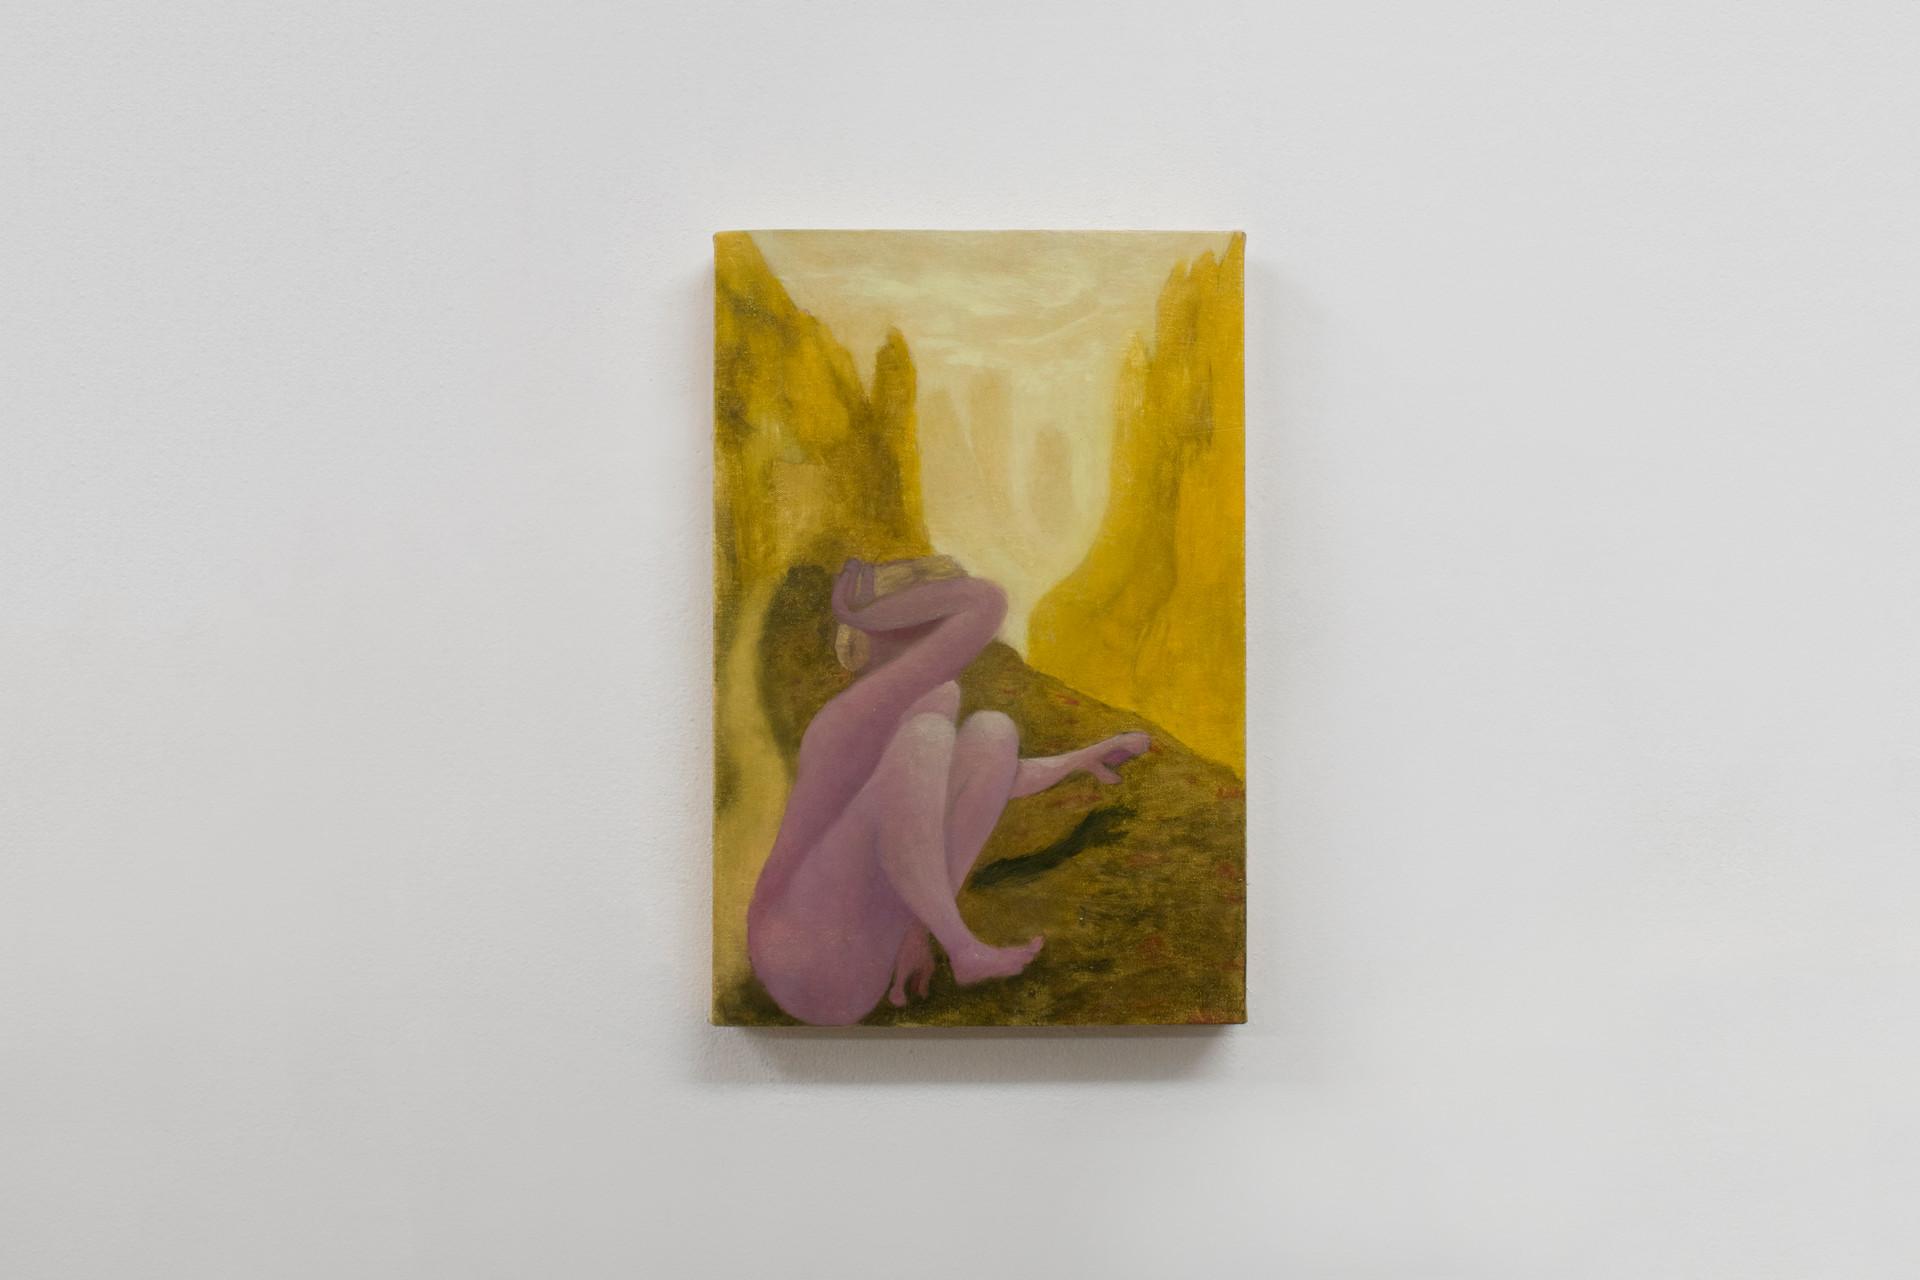 Blindness, 2018 | Oil on canvas | 30x20cm